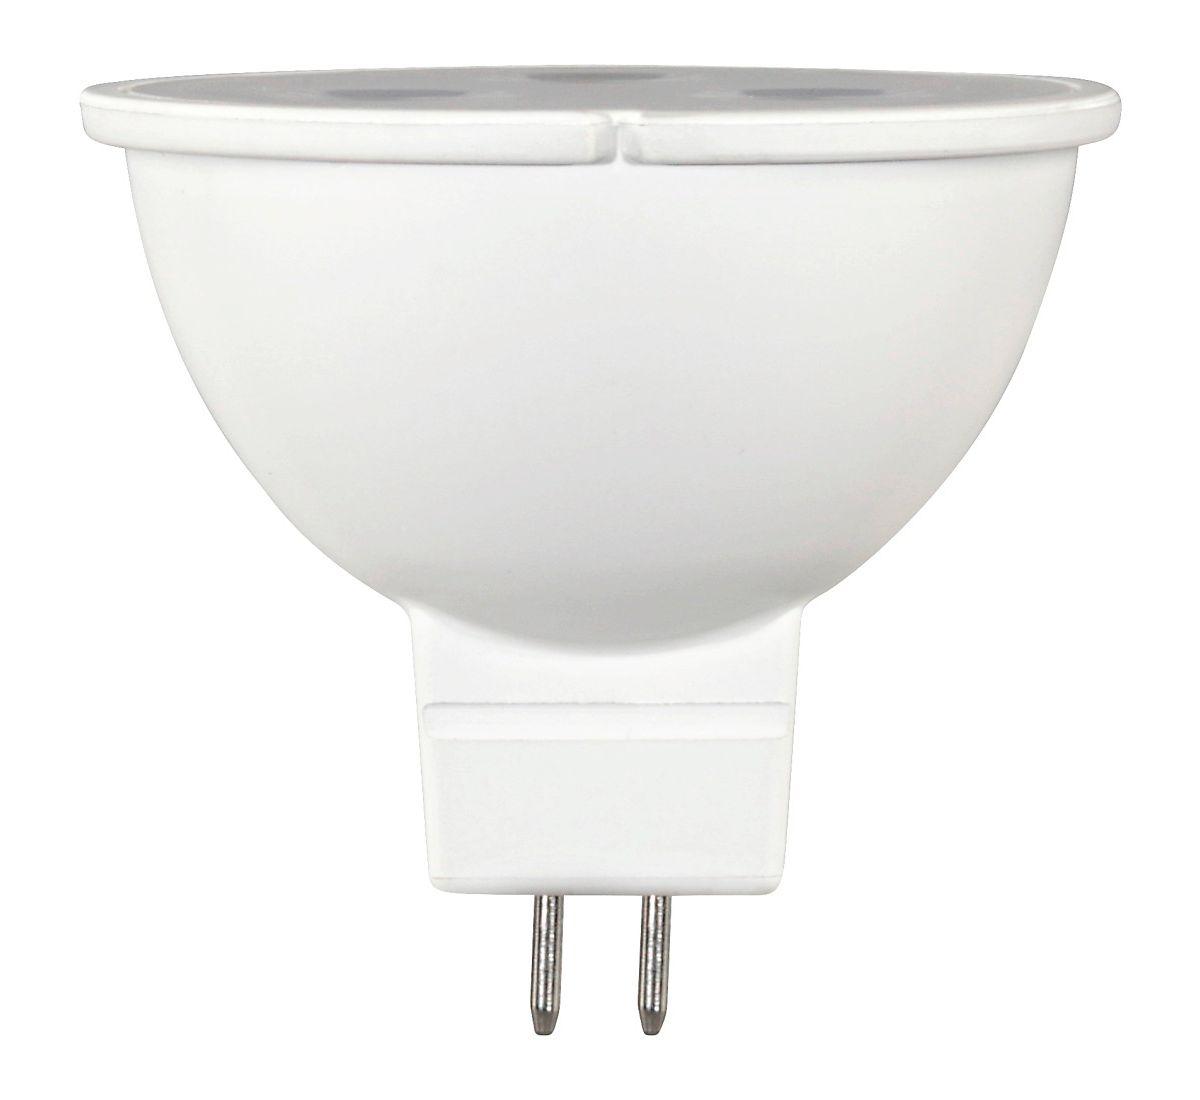 Xavax LED-Lampe, GU5.3, 430lm ersetzt 40W, Refl...